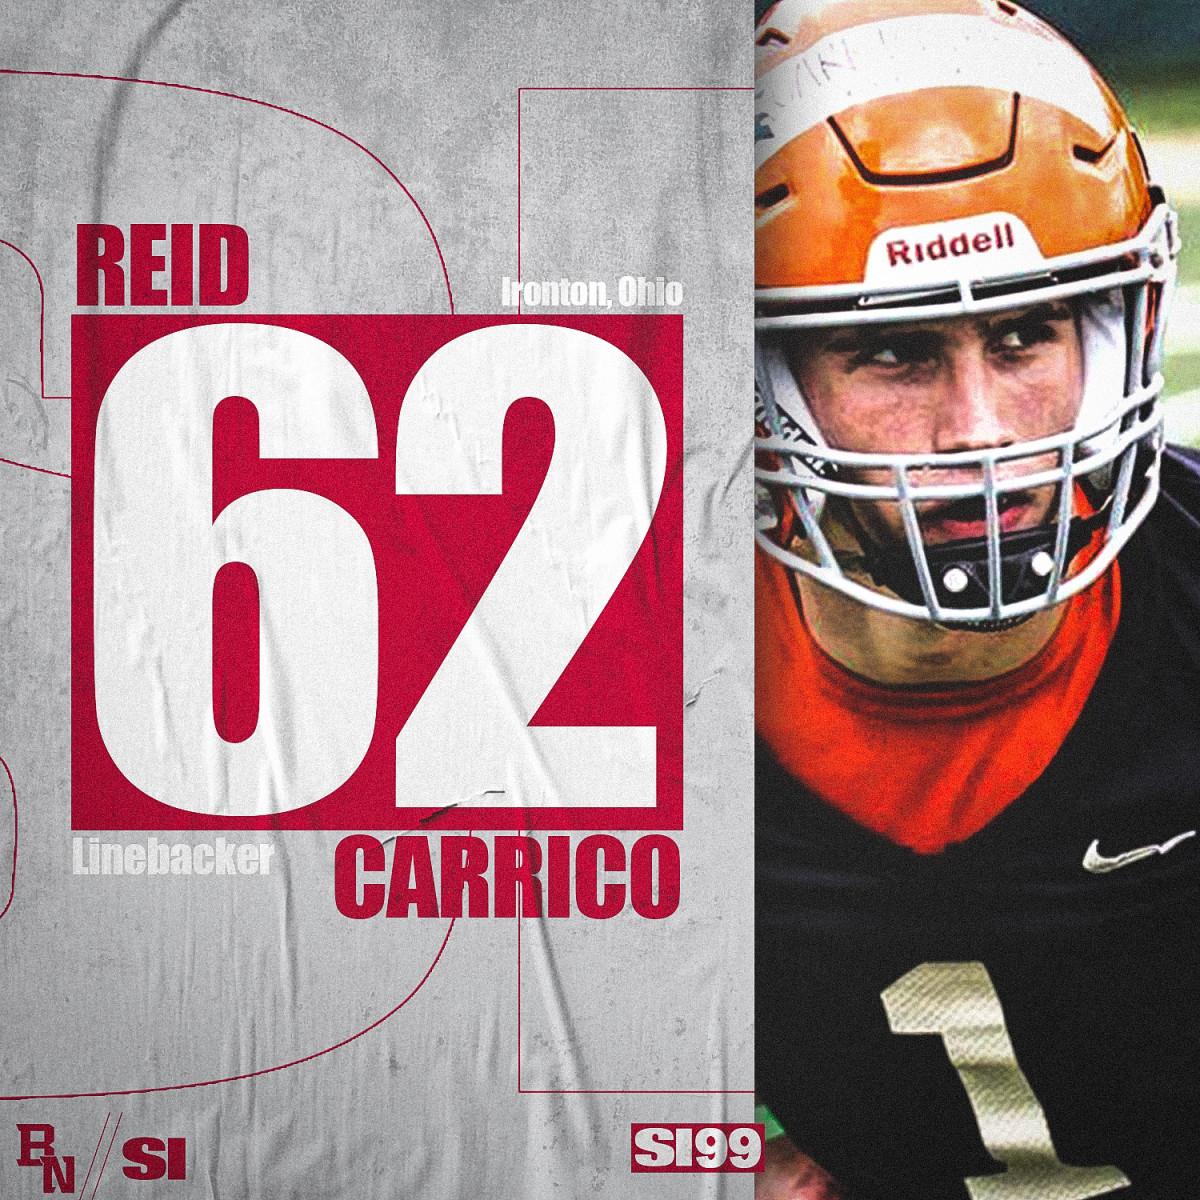 Reid_Carrico